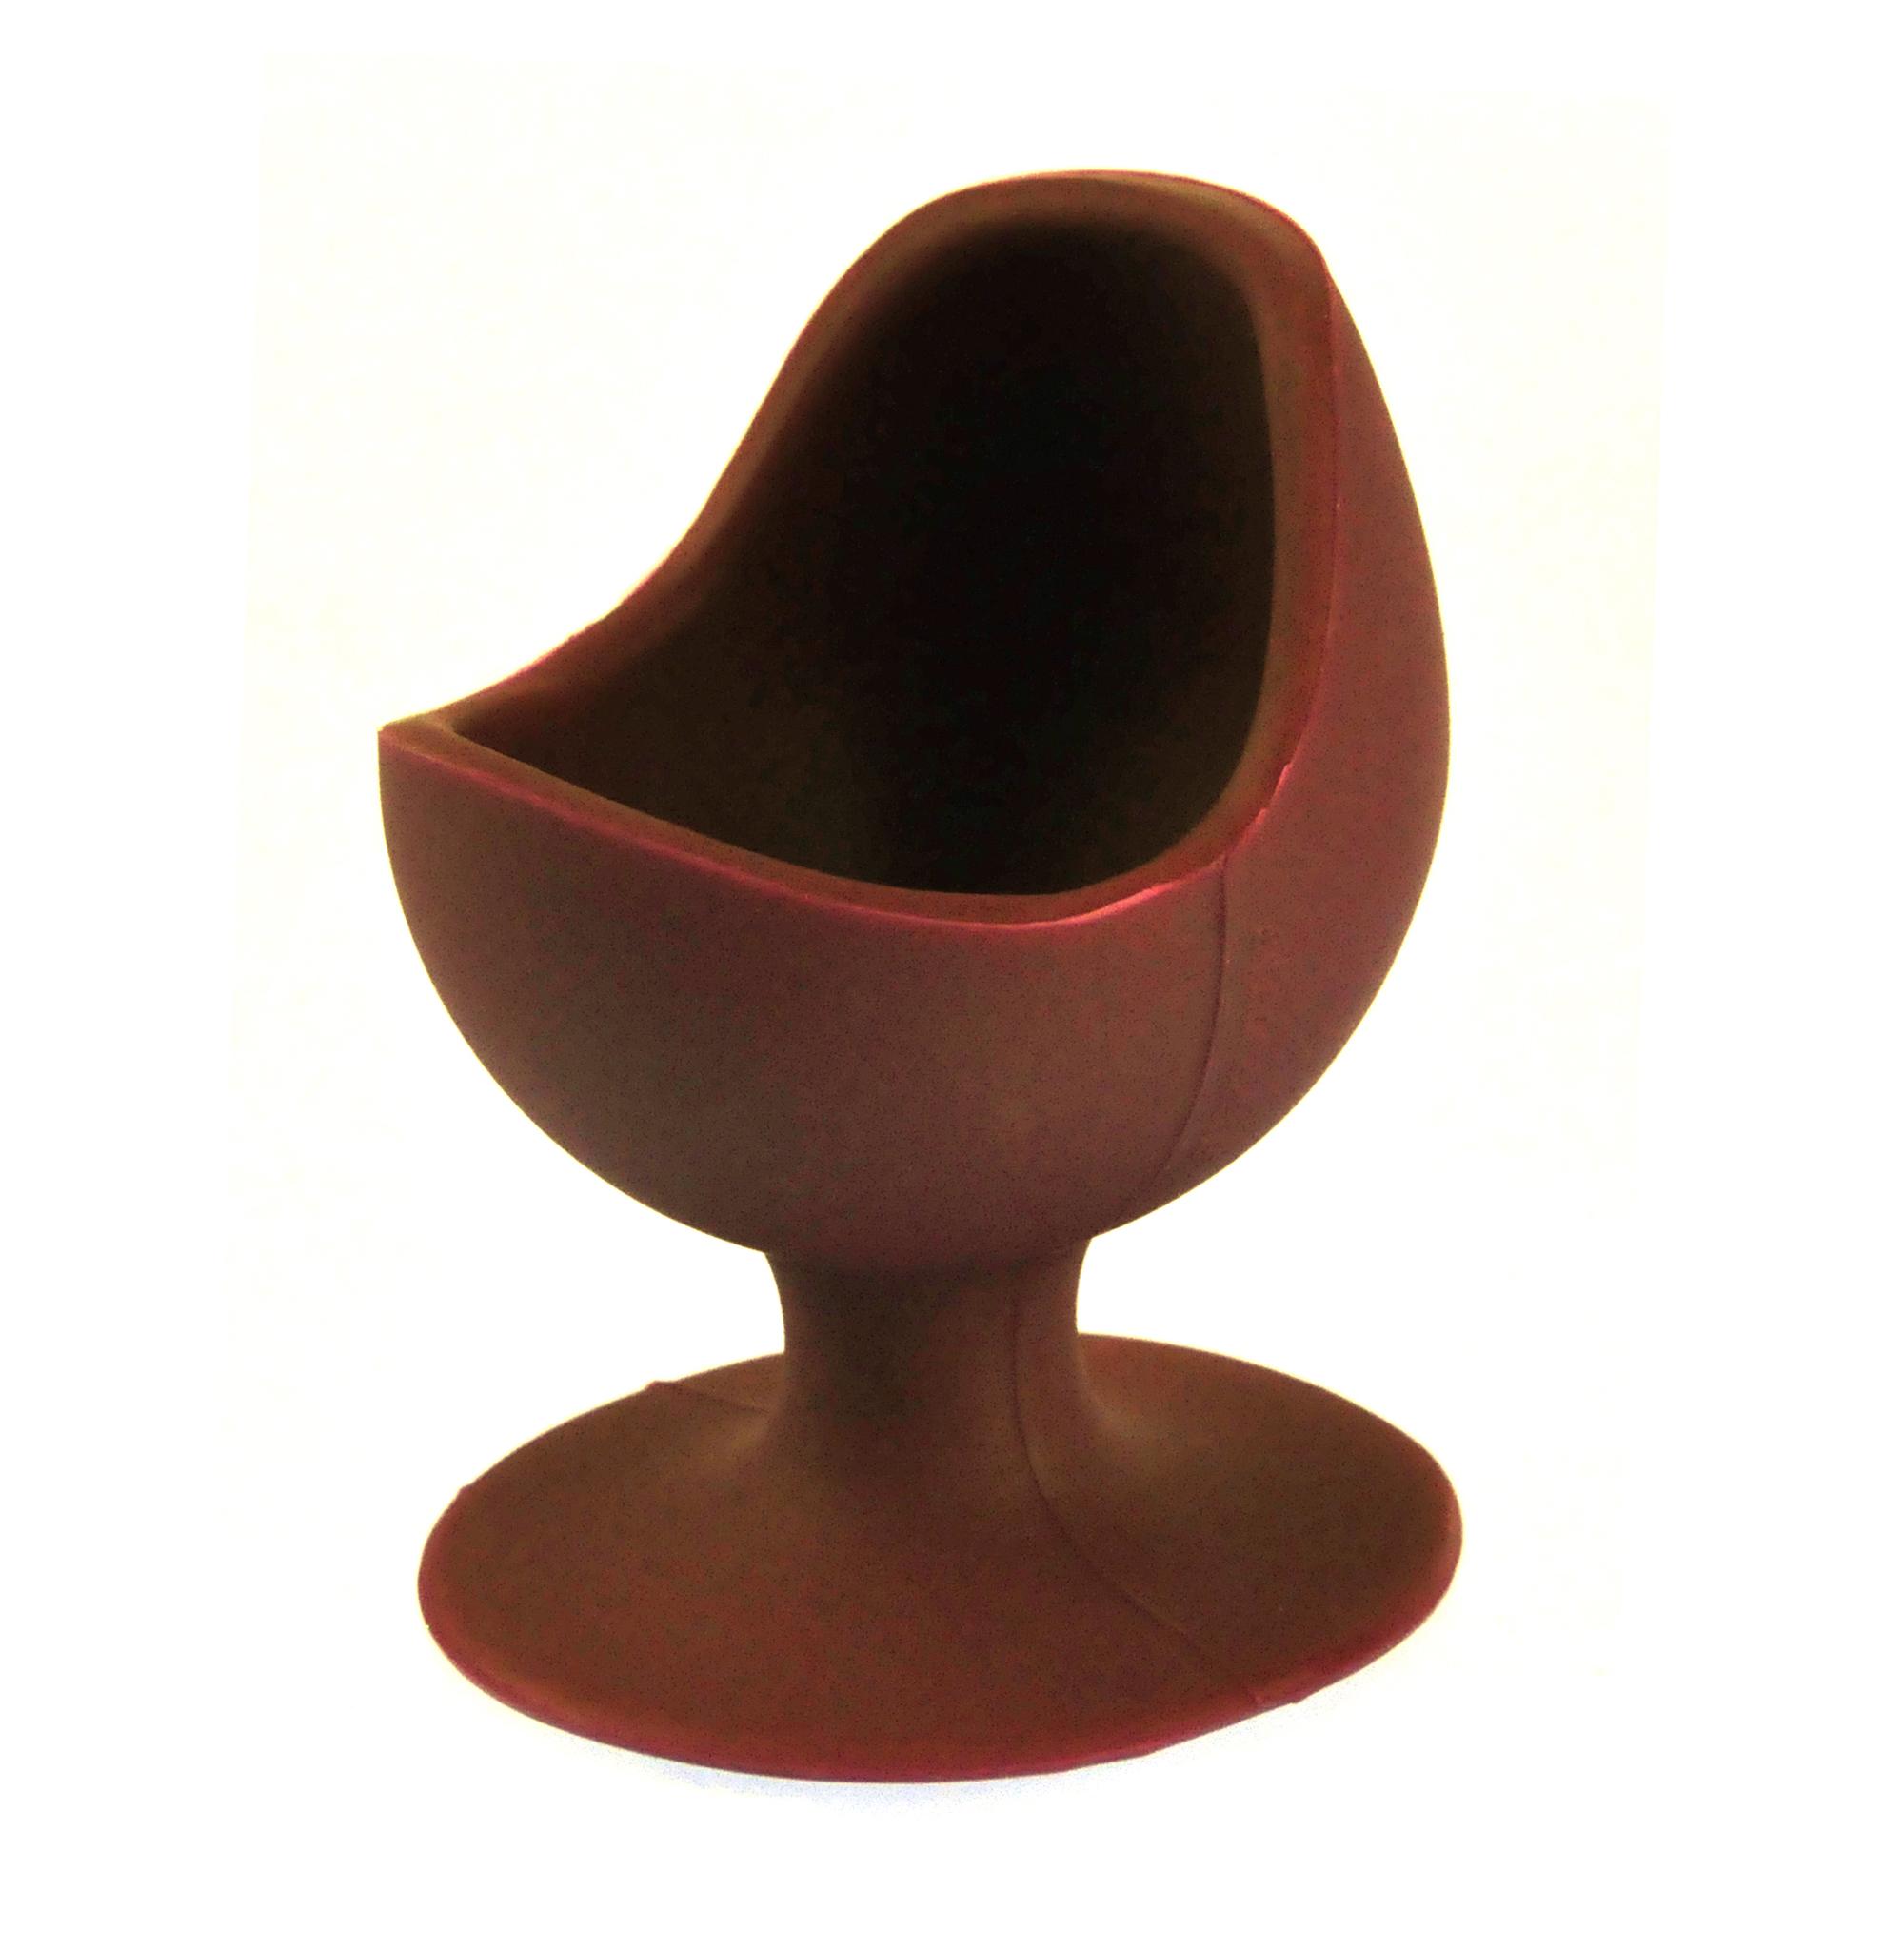 kastanienbraun ei sessel silikon zonen sammlung eierbecher. Black Bedroom Furniture Sets. Home Design Ideas